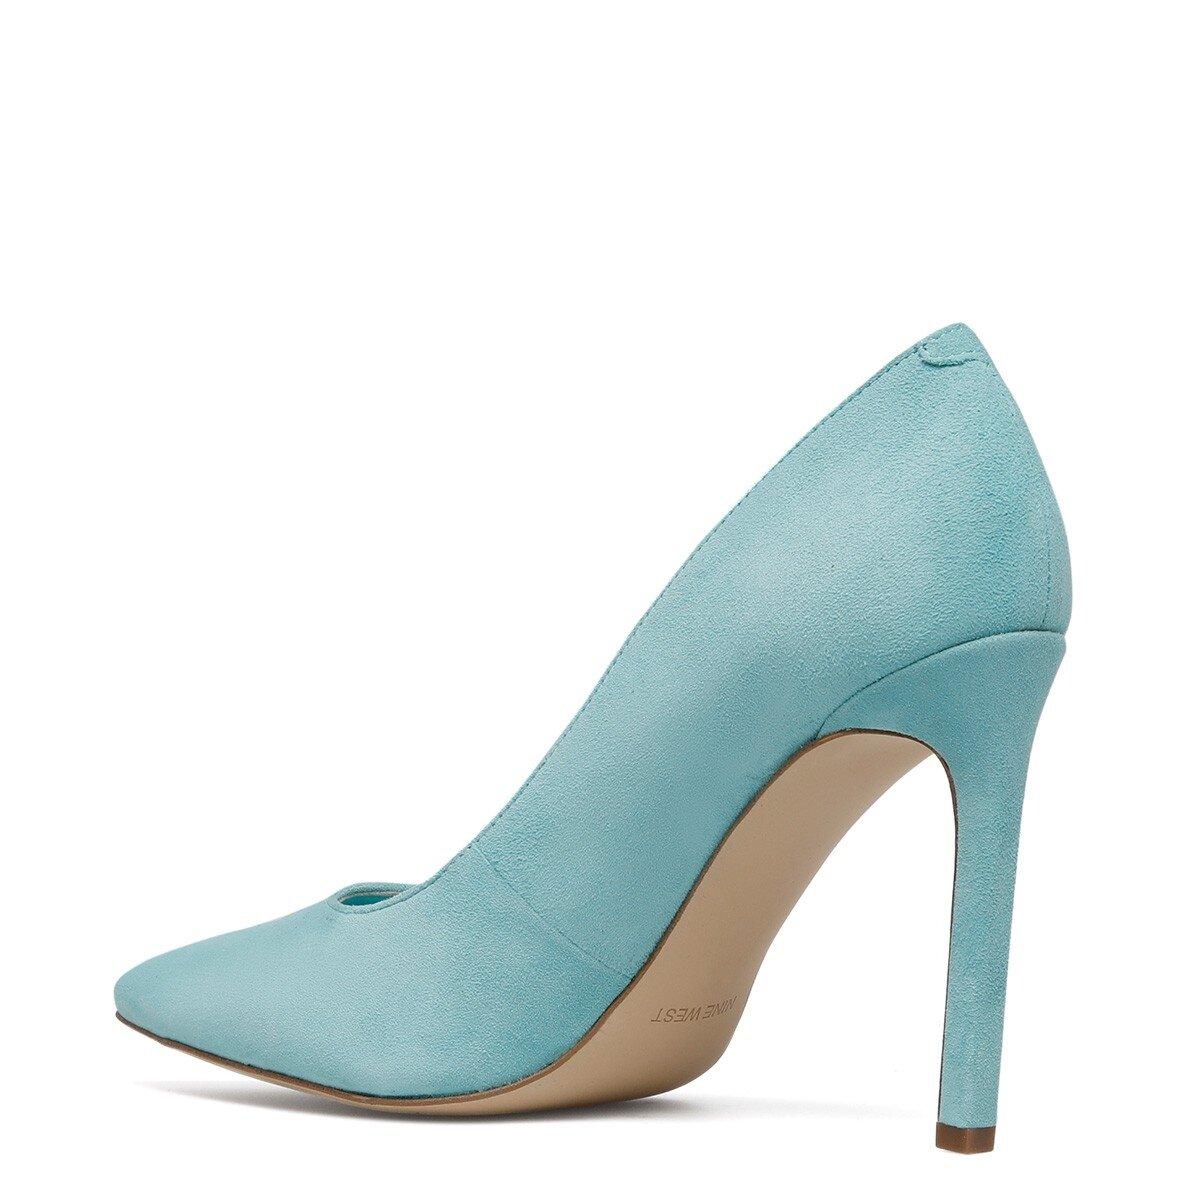 TATIANA Mavi Kadın Stiletto